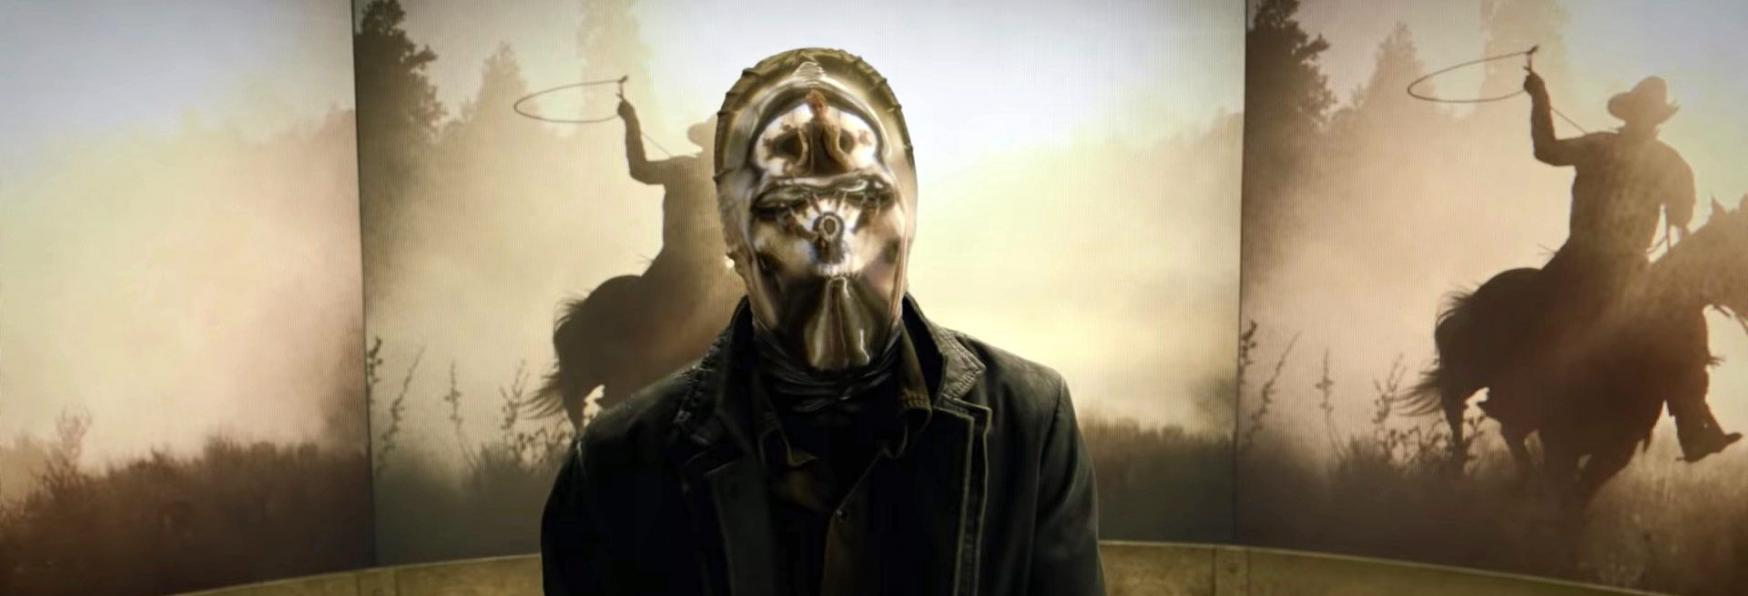 Watchmen: Nicole Kassell rivela nuovi Retroscena sulla Serie TV targata HBO